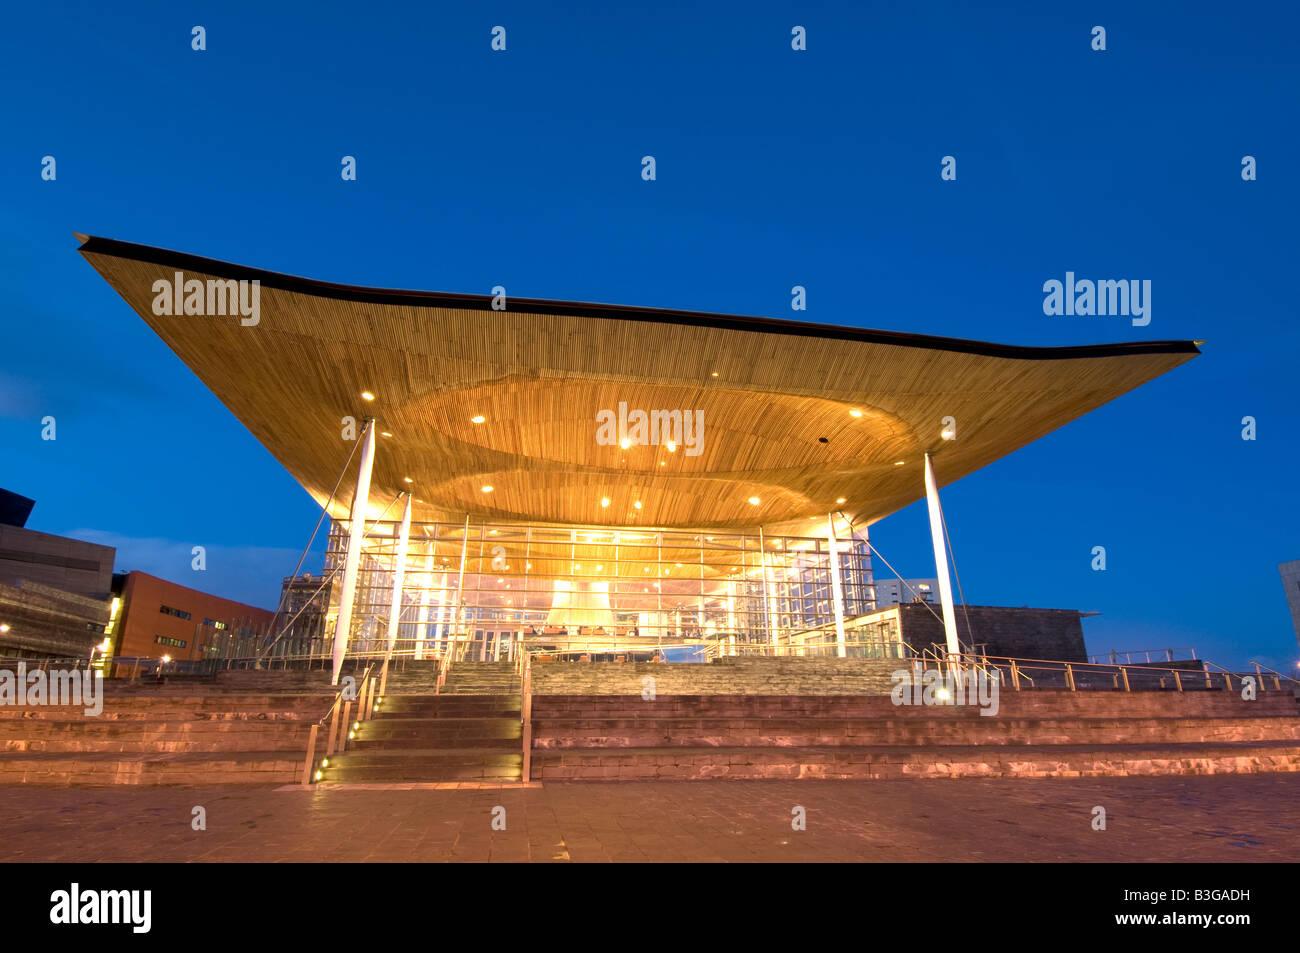 Welsh Assembly Senedd Building at night. Stock Photo